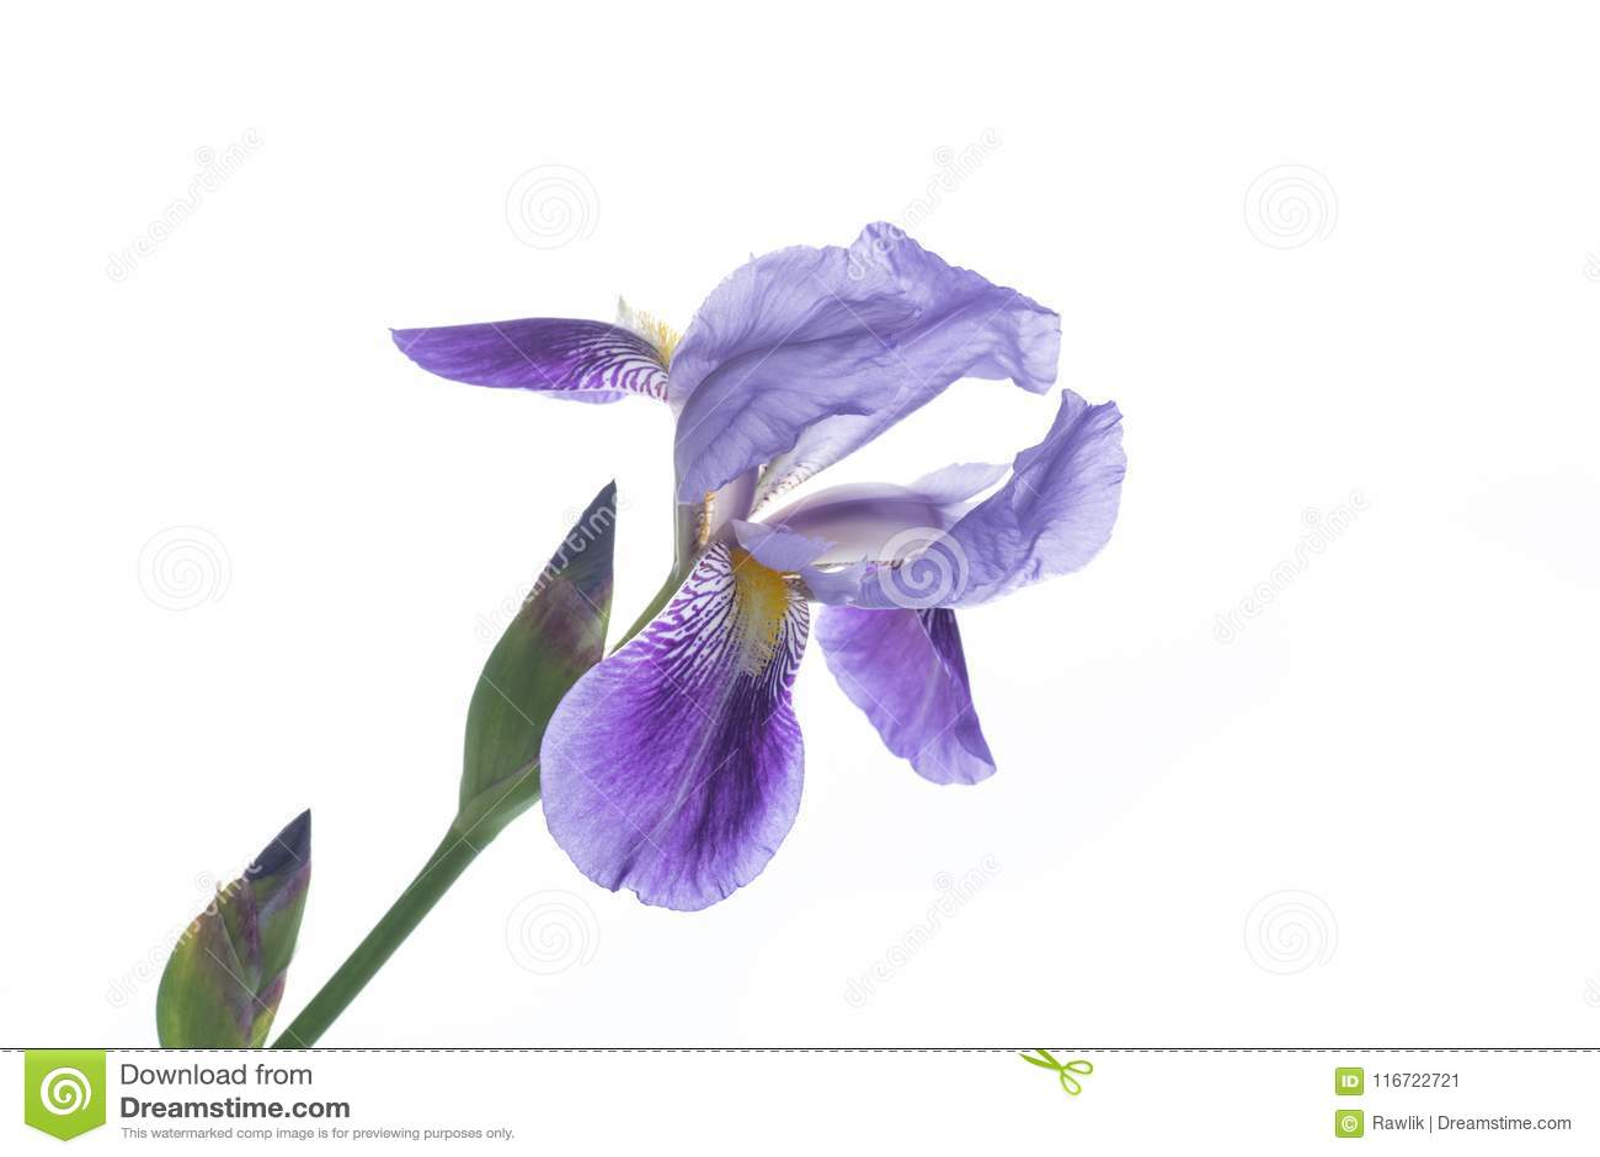 Beautiful Violet Iris Flower Stock Image Image Of Love Beauty